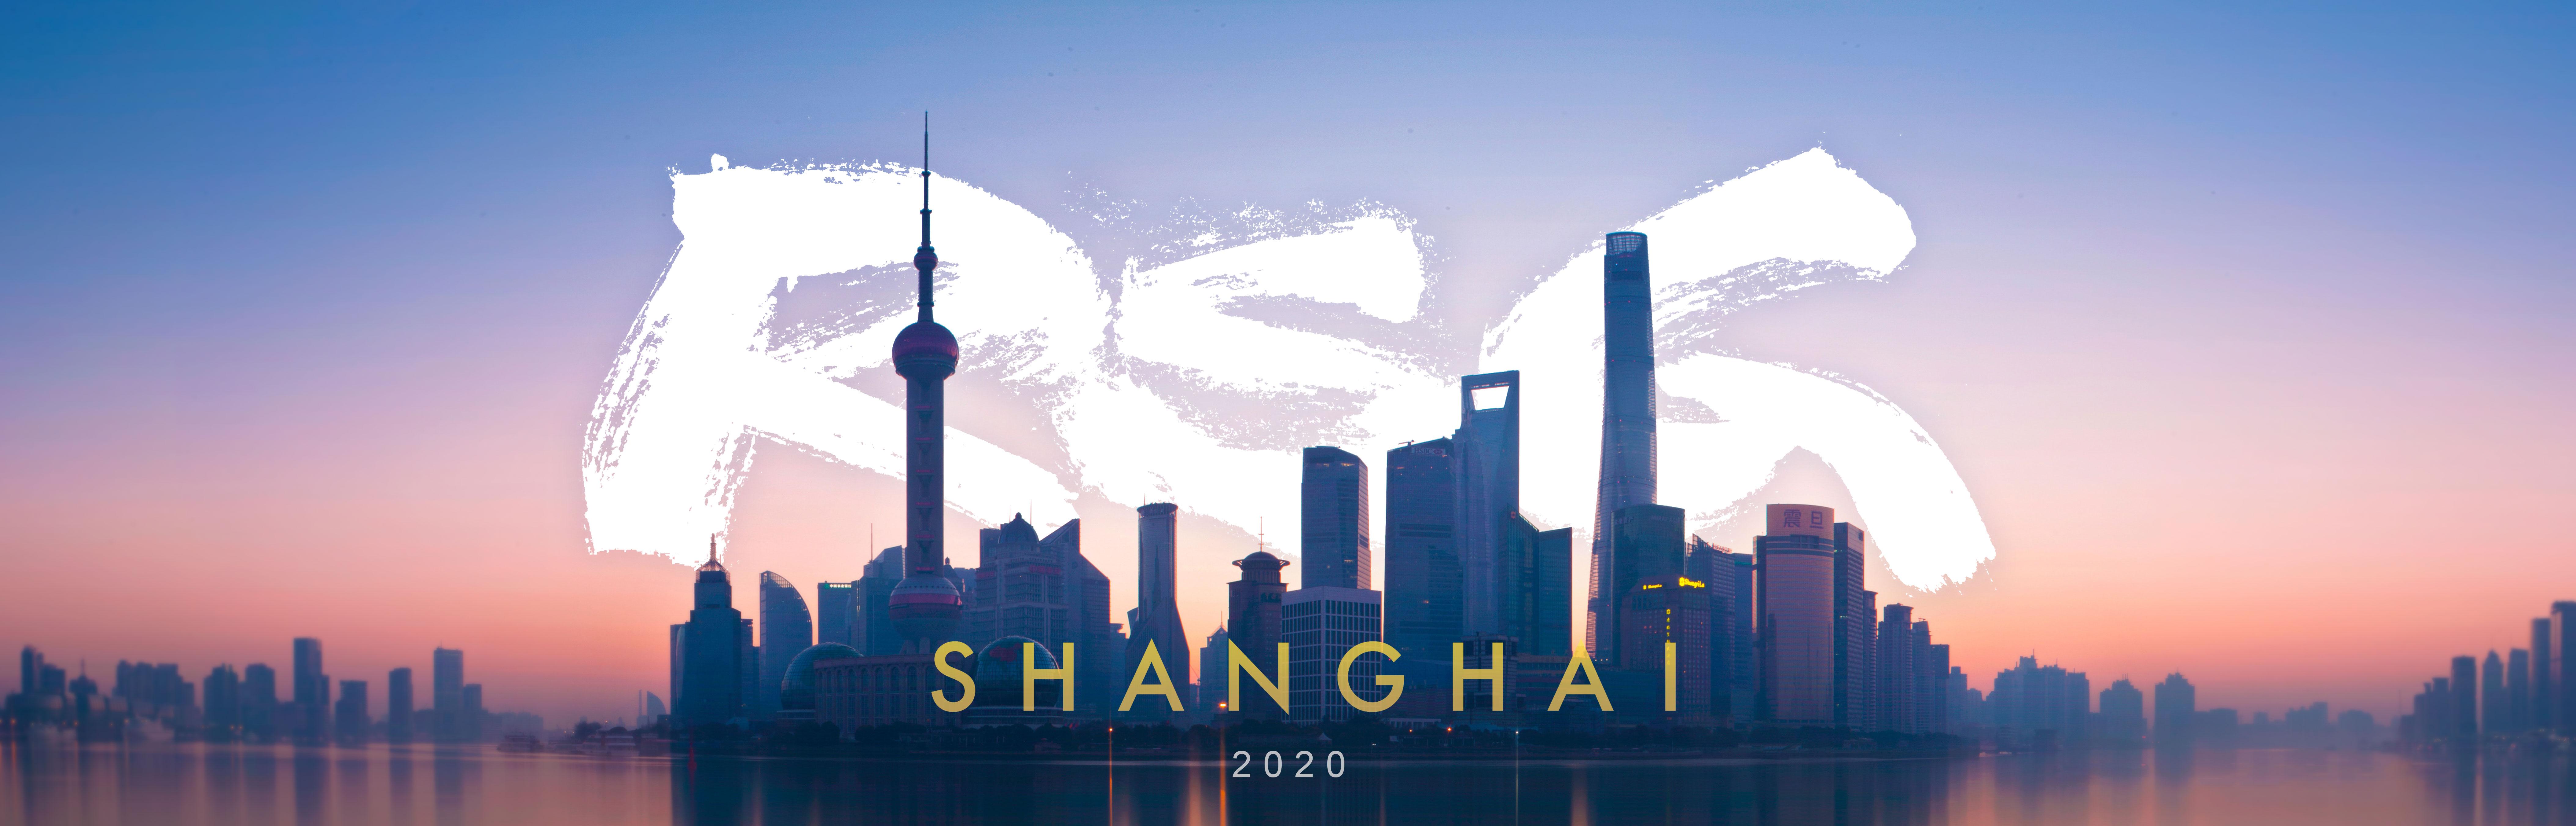 August,2020,Shanghai,China